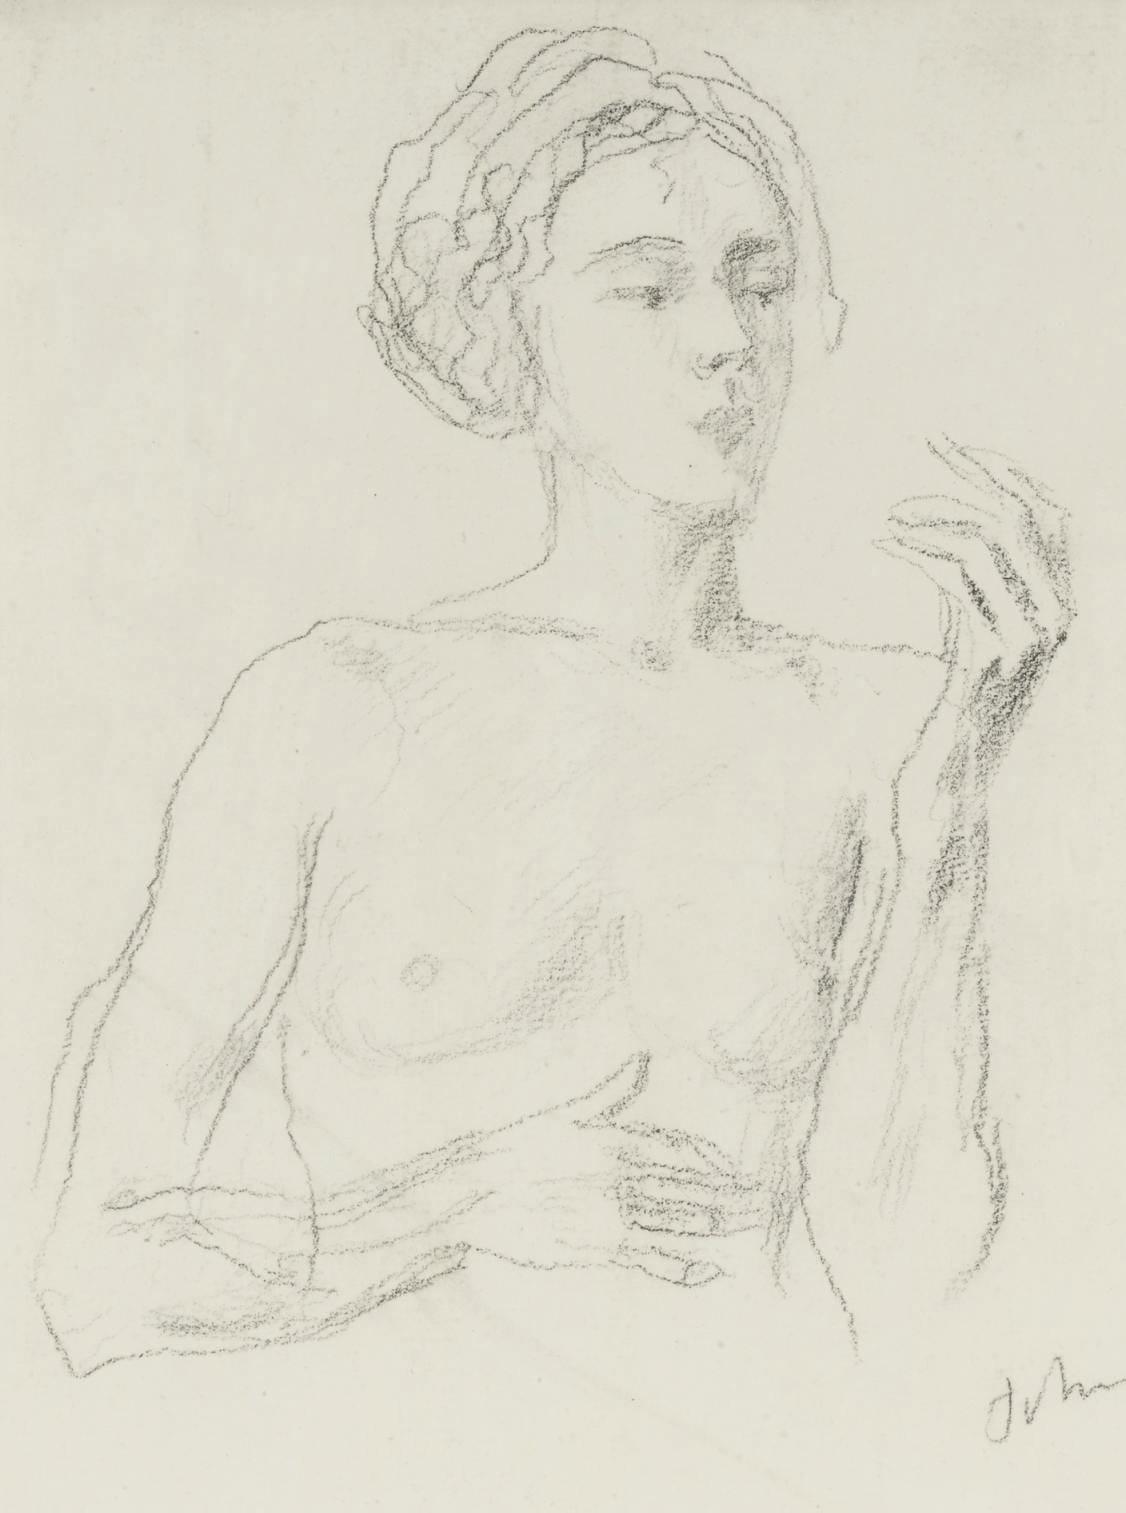 Augustus Edwin John, R.A. (187